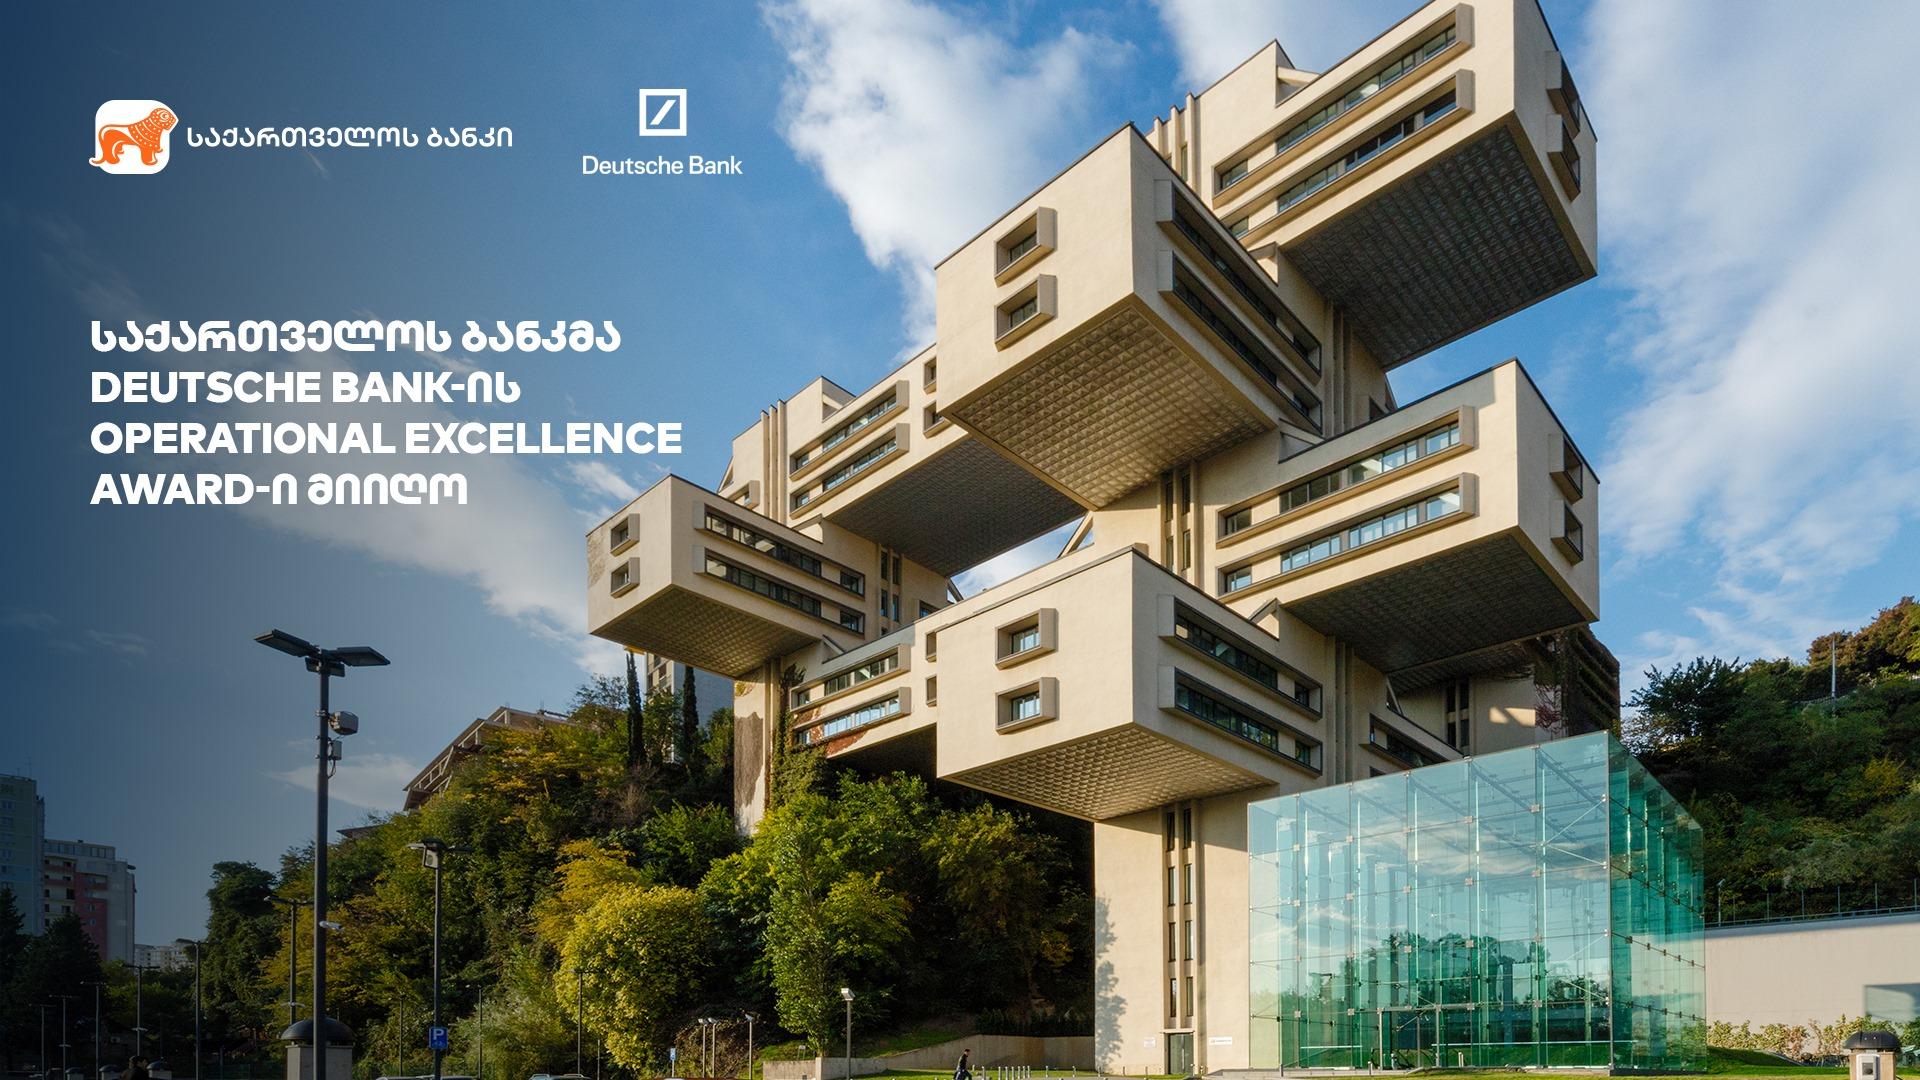 Photo of საქართველოს ბანკმა Deutsche Bank-ისგან Operational Excellence Award-ი მიიღო